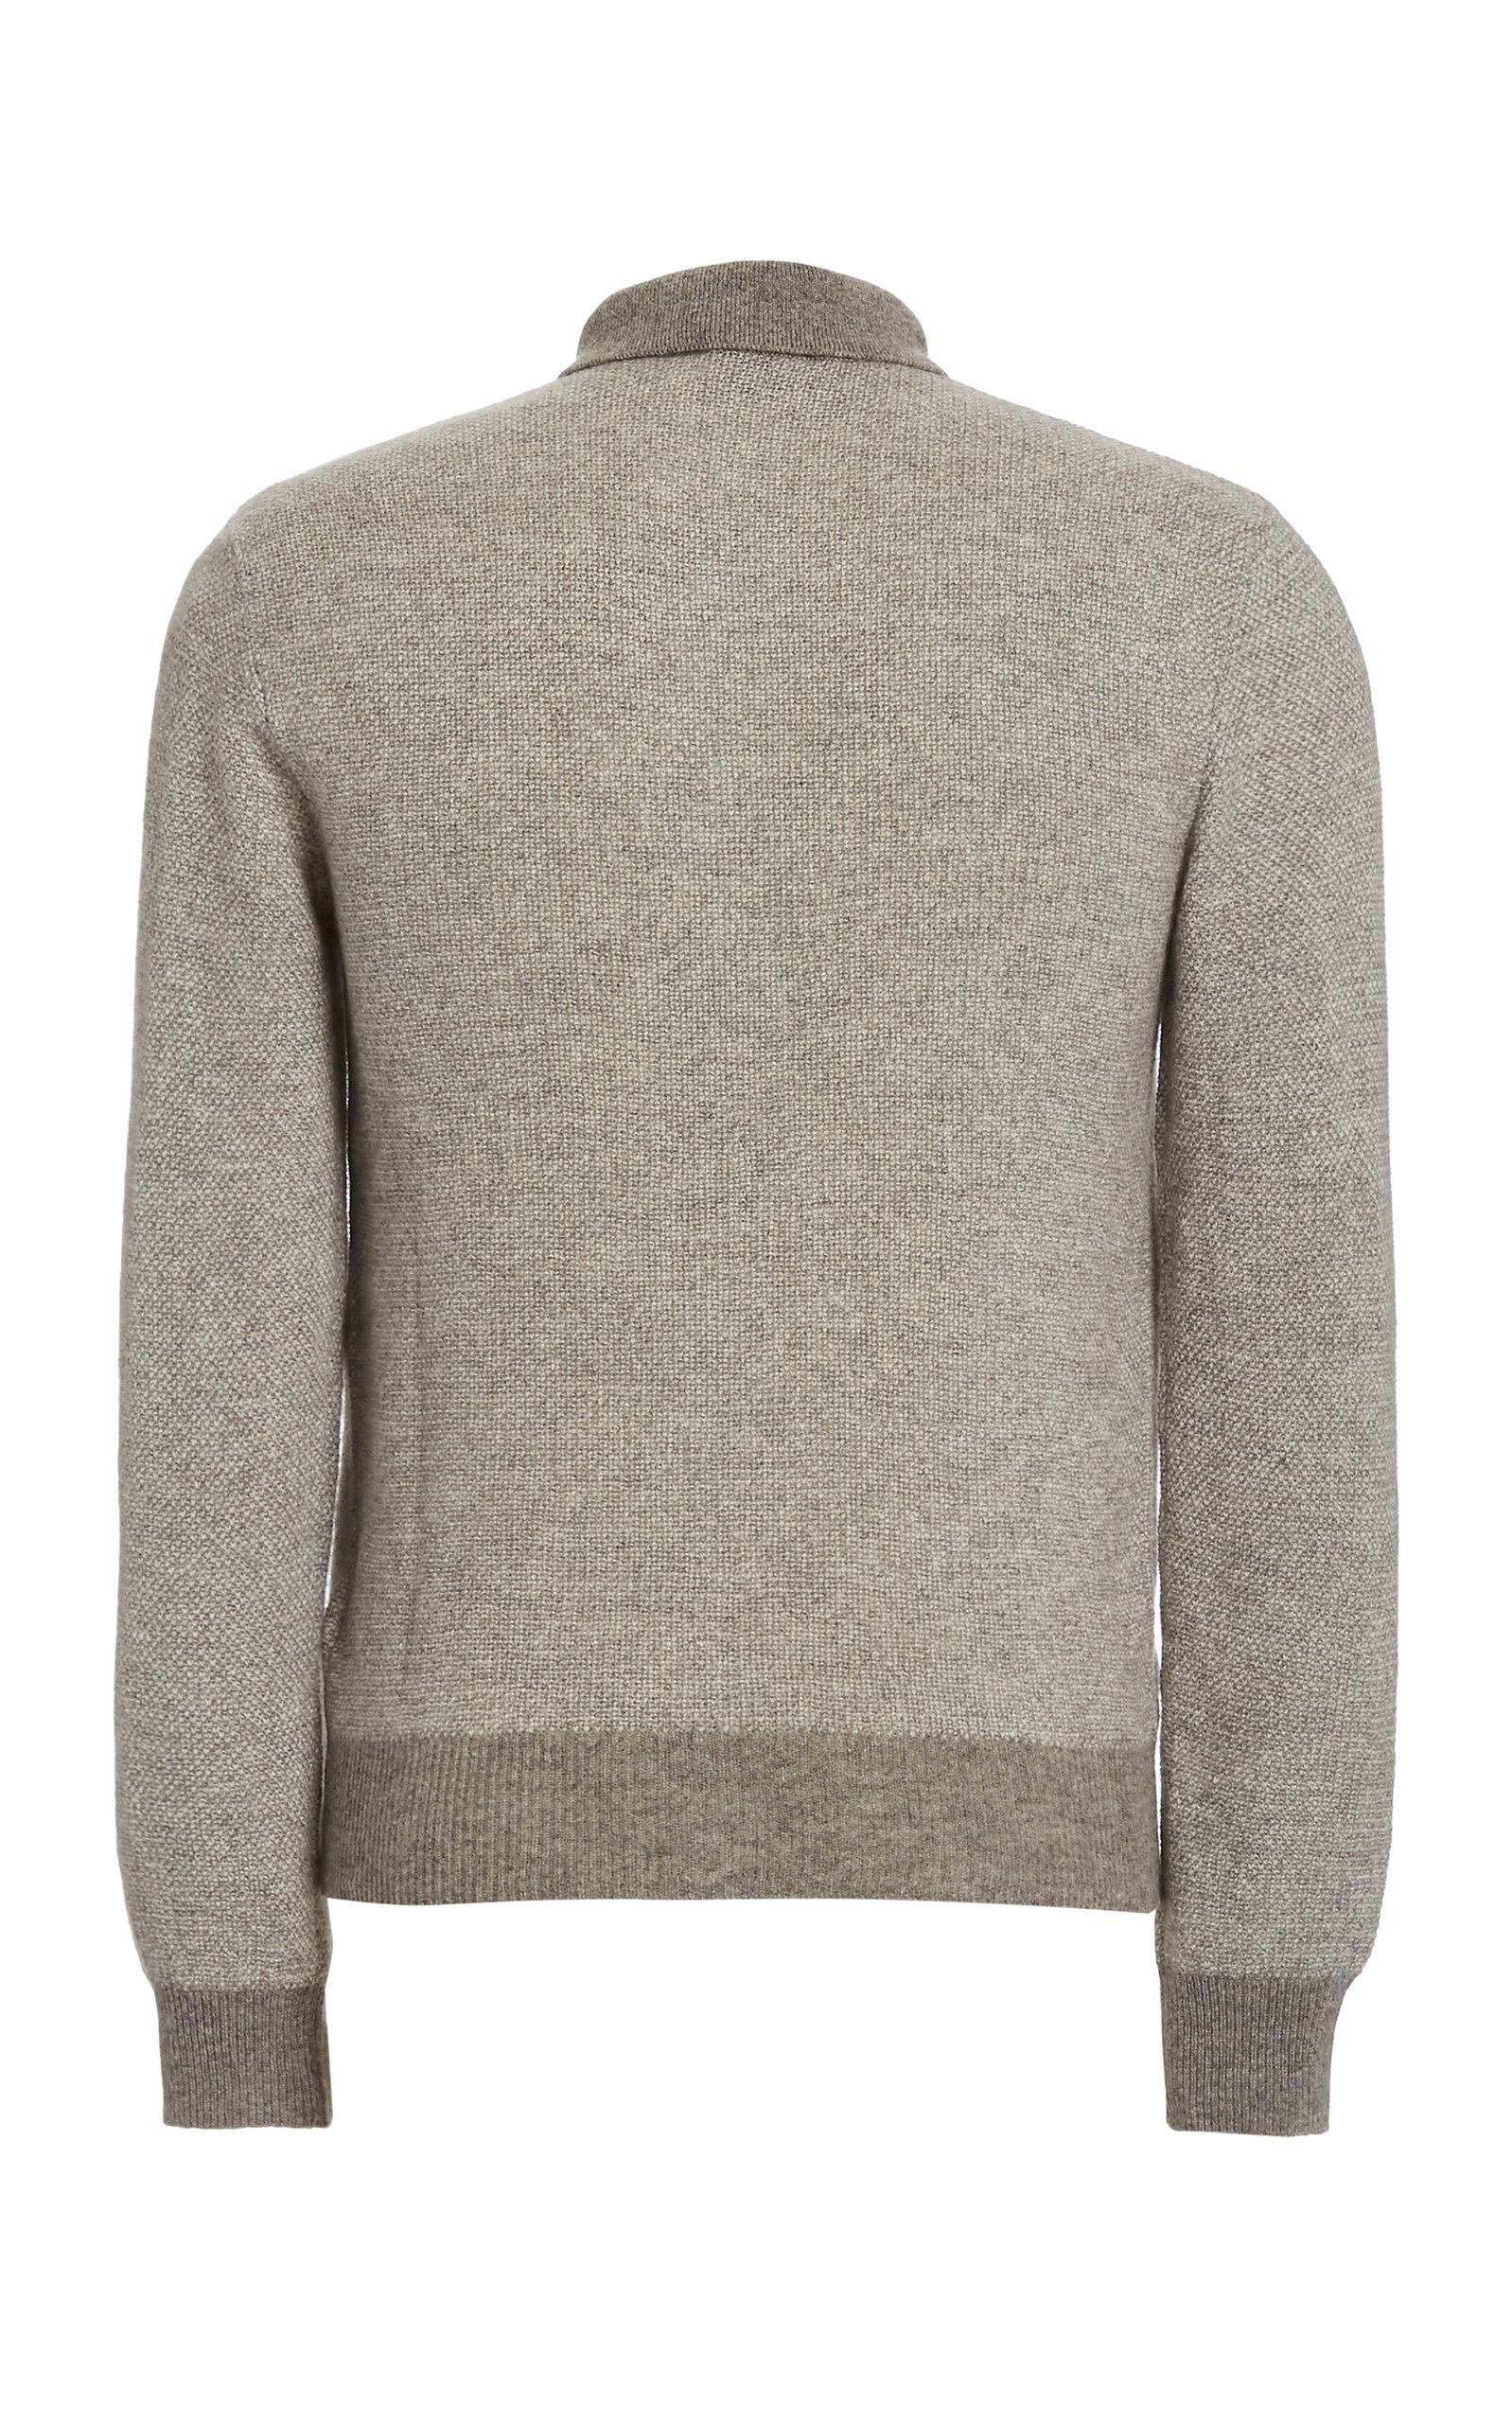 Ralph Lauren Purple Label Grey Crewneck Jersey T-Shirt Sweater New $395